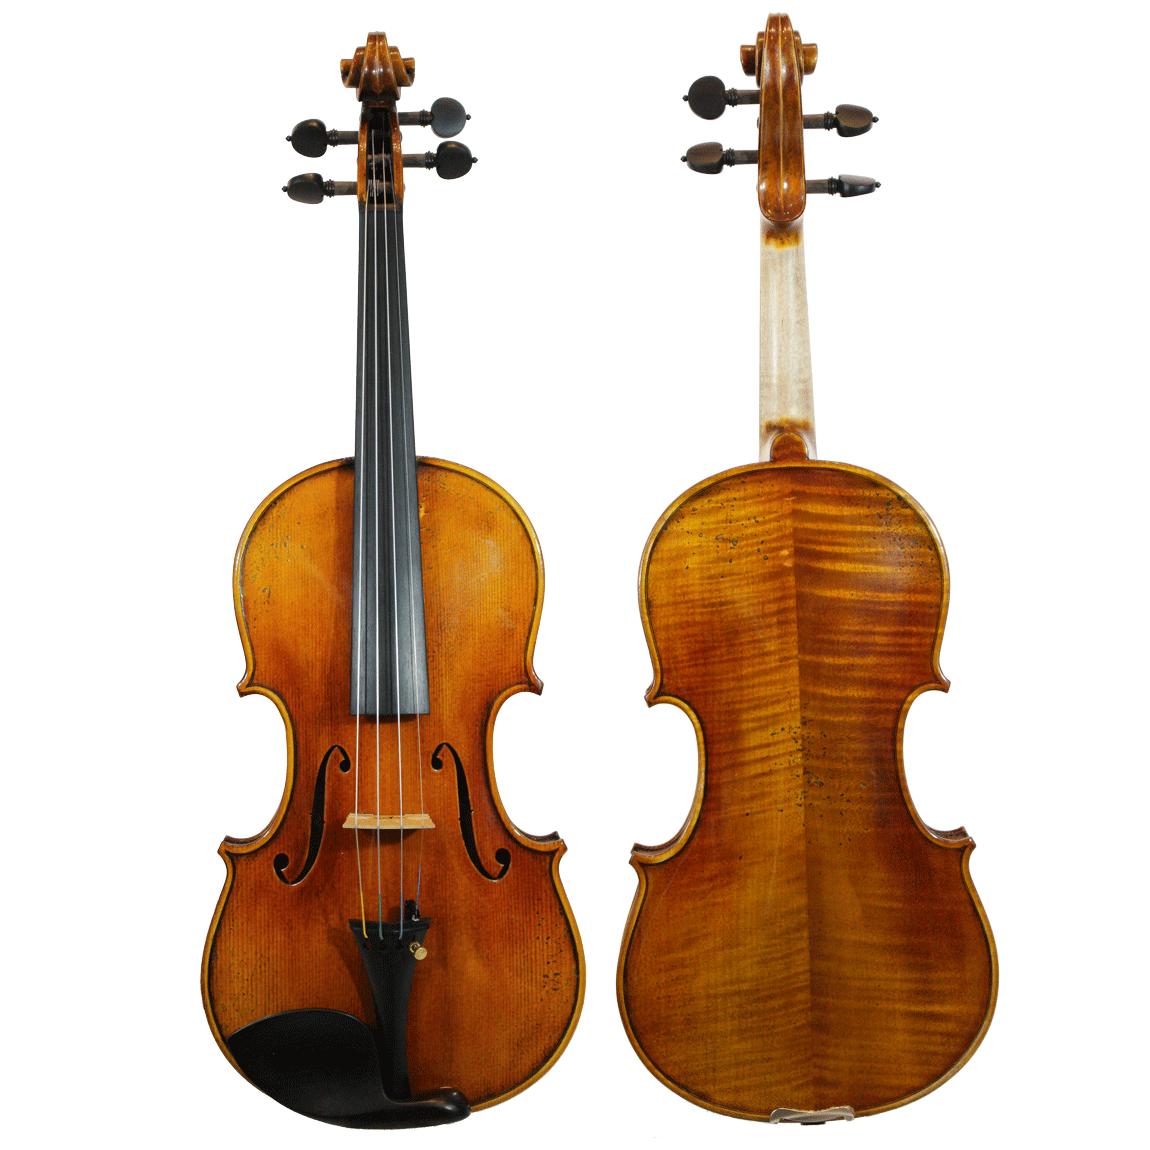 Violino feito à mão modelo Guarneri 4/4 verniz goma laca